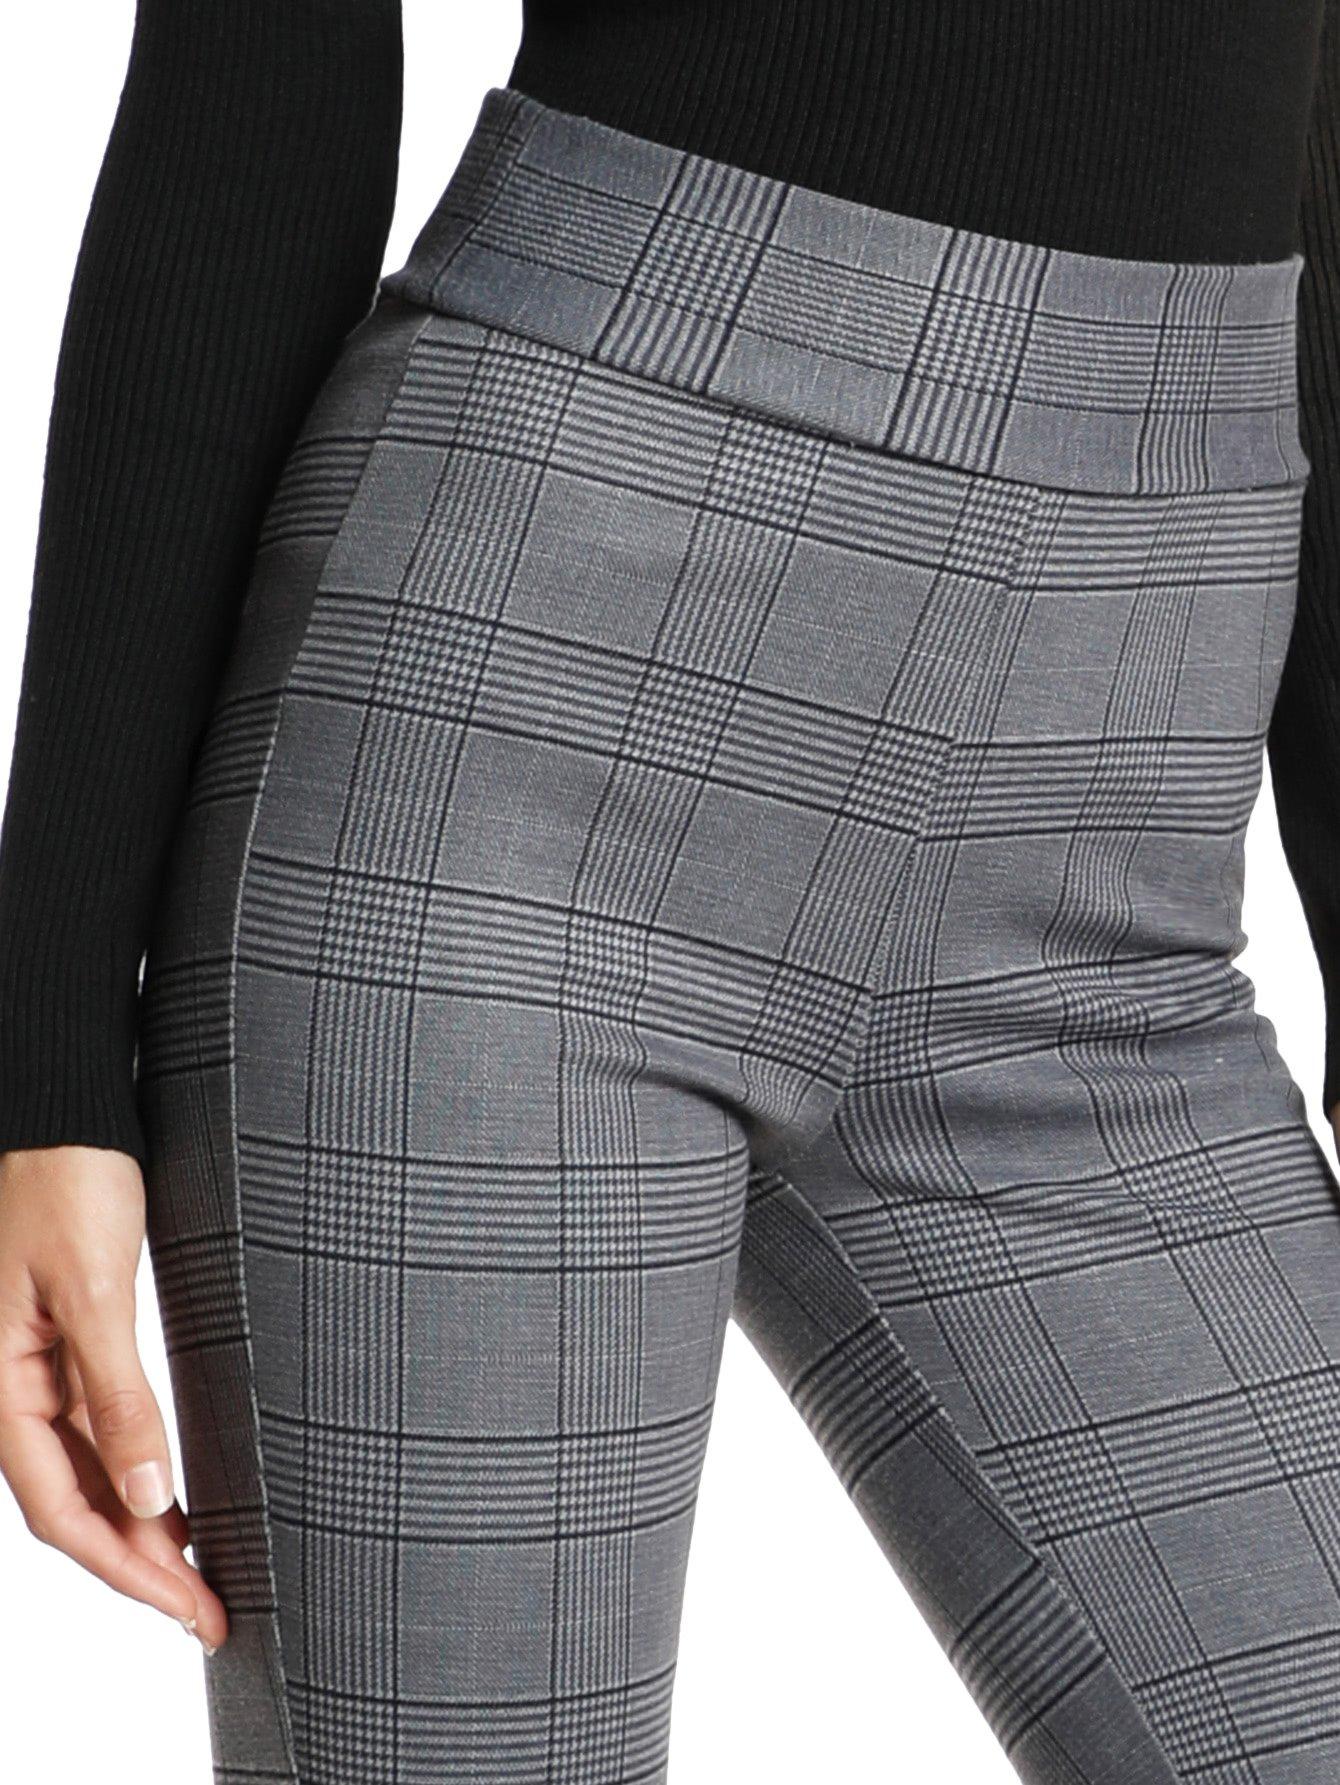 SweatyRocks Women's Casual High Waisted Ankle Plaid Pants Skinny Leggings, Grey #1, L by SweatyRocks (Image #5)